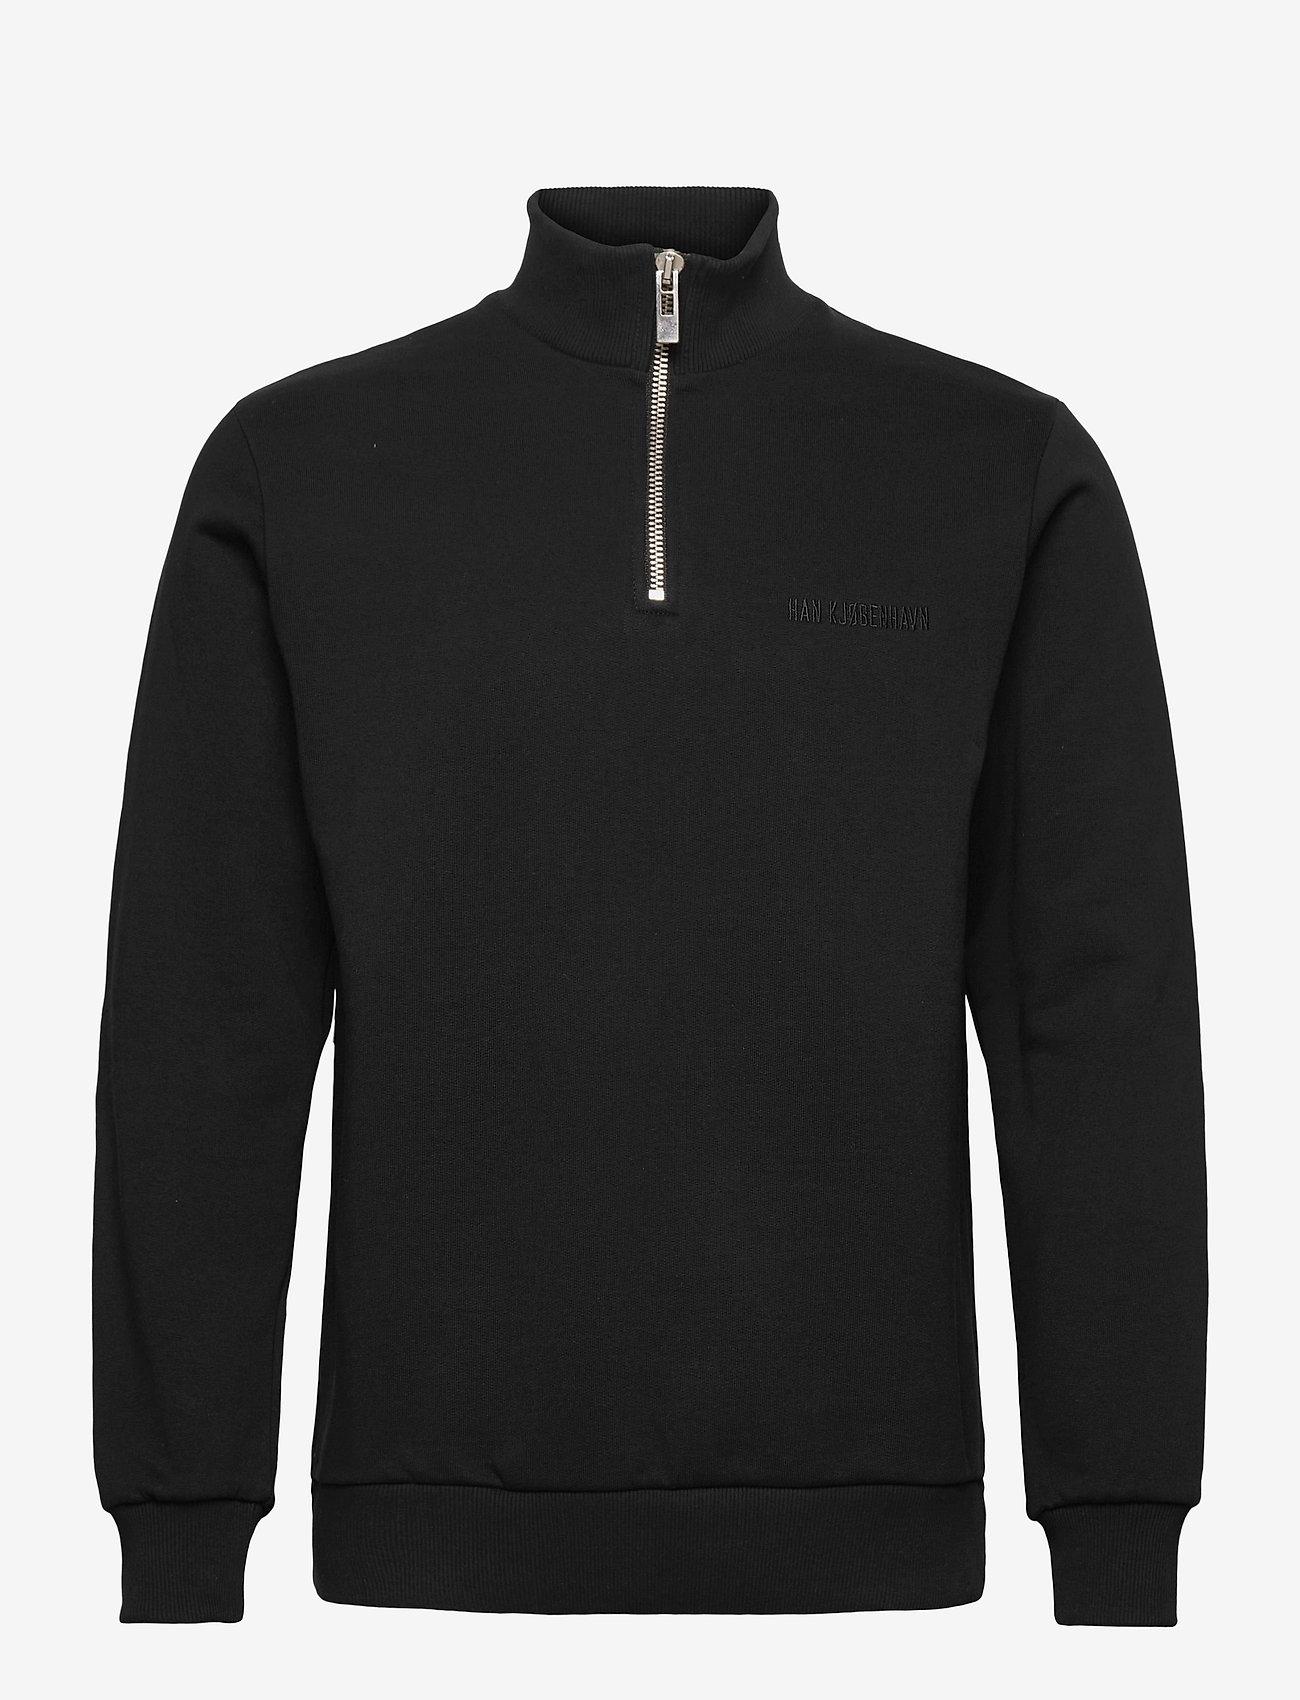 HAN Kjøbenhavn - Half Zip Sweat - basic sweatshirts - black logo - 0